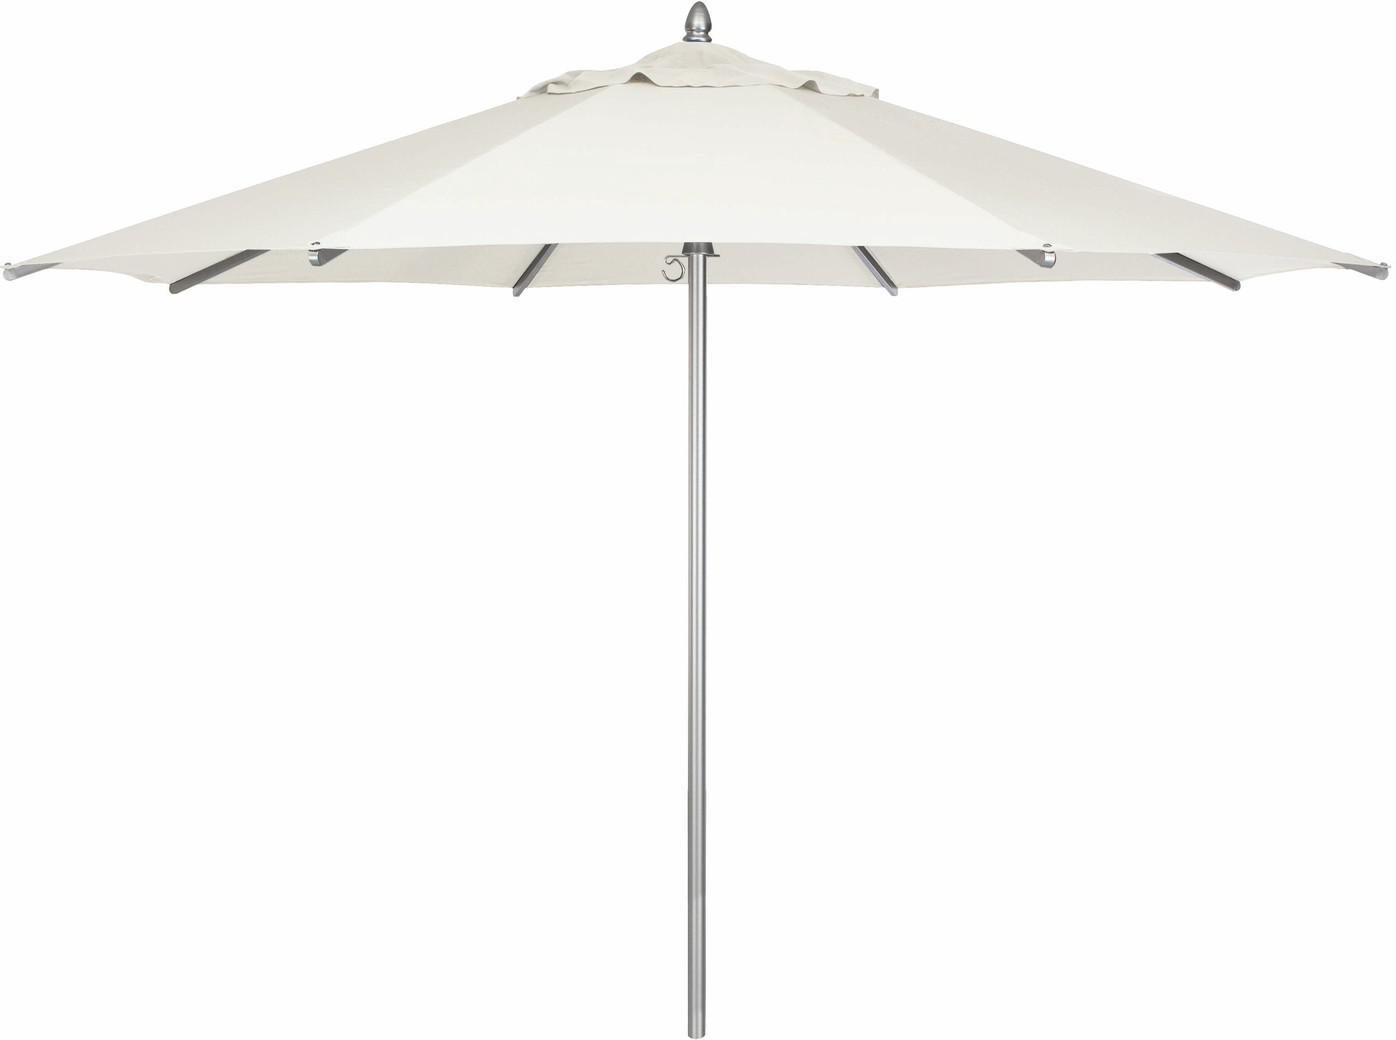 Umbrella - aluminium - Ø350 -  canvas